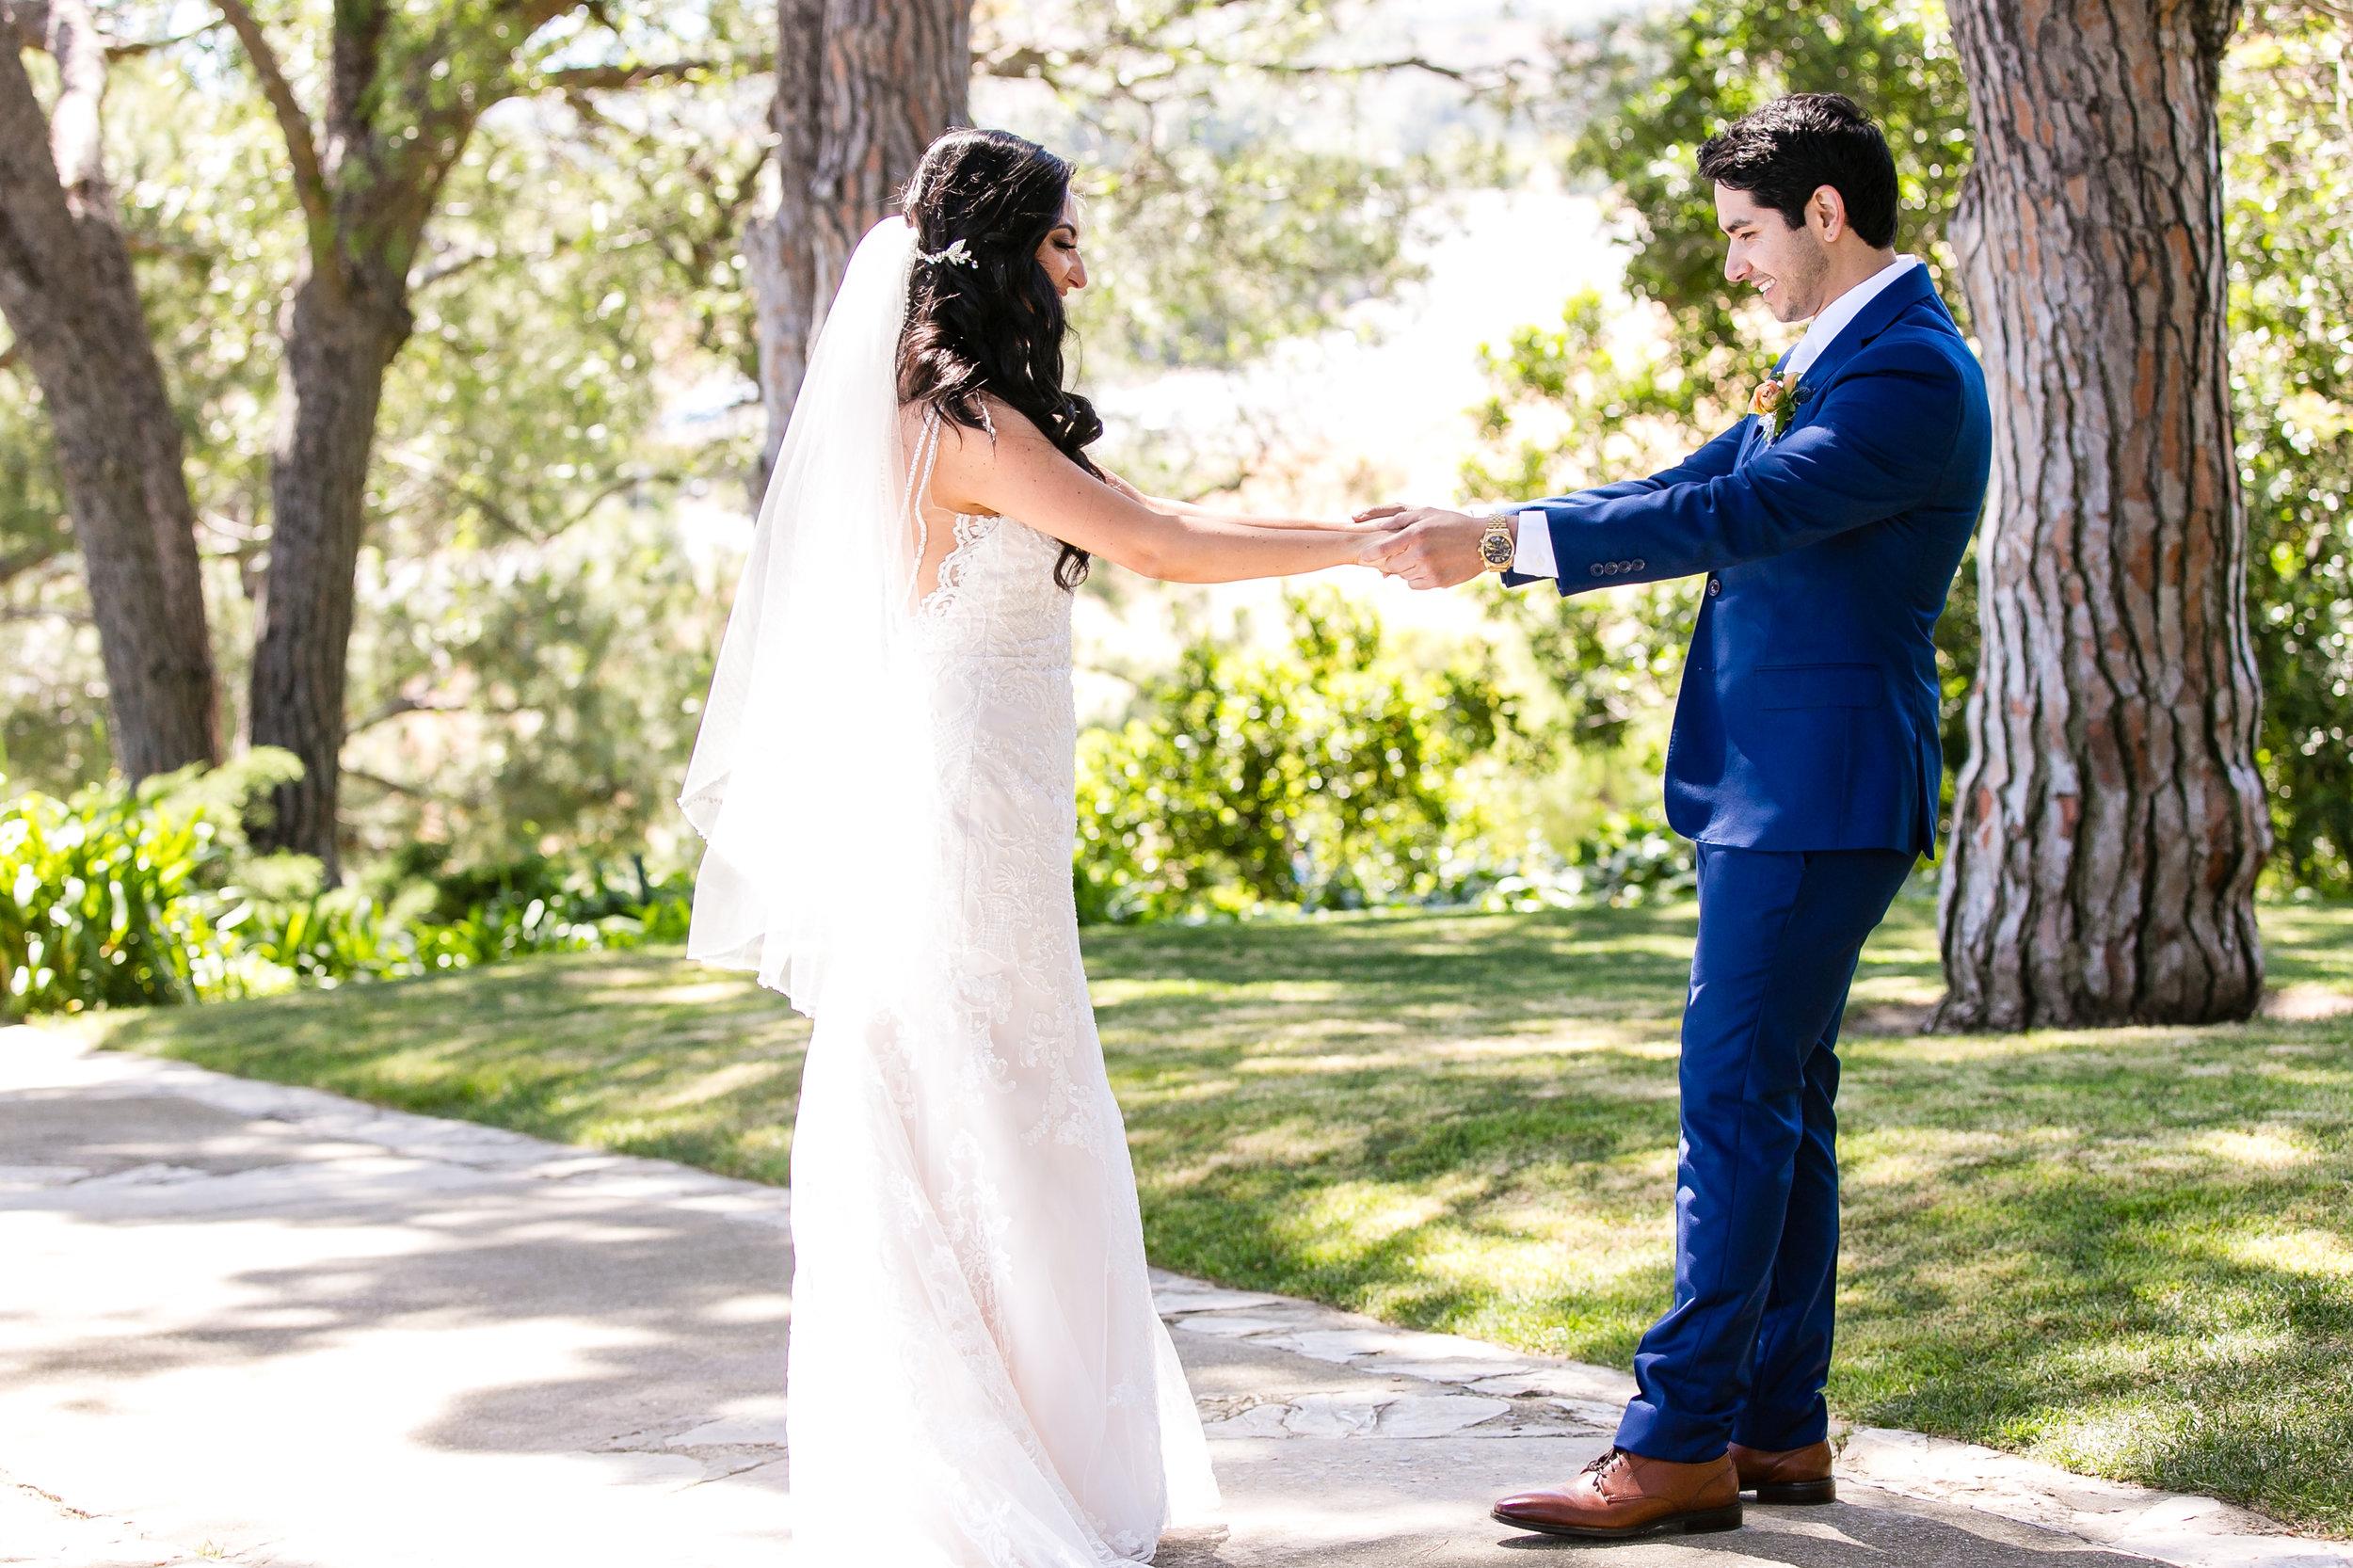 2019_05_24_Wedding_Barajas_0328.jpg